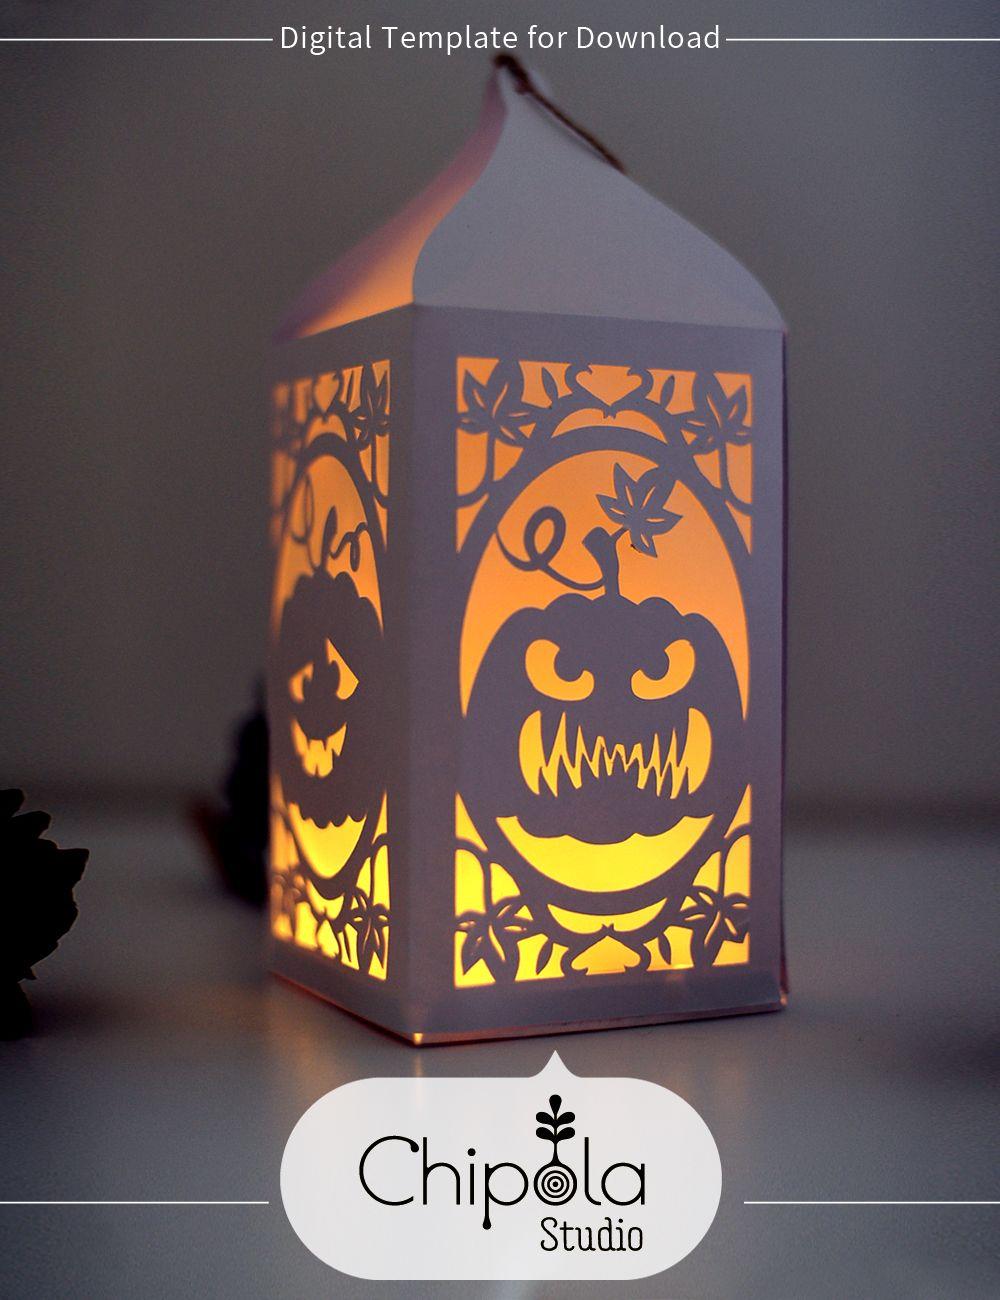 Halloween Pumpkin Lantern Digital Downloadable Template Chipola Studio Halloween Pumpkins Lanterns Halloween Lanterns